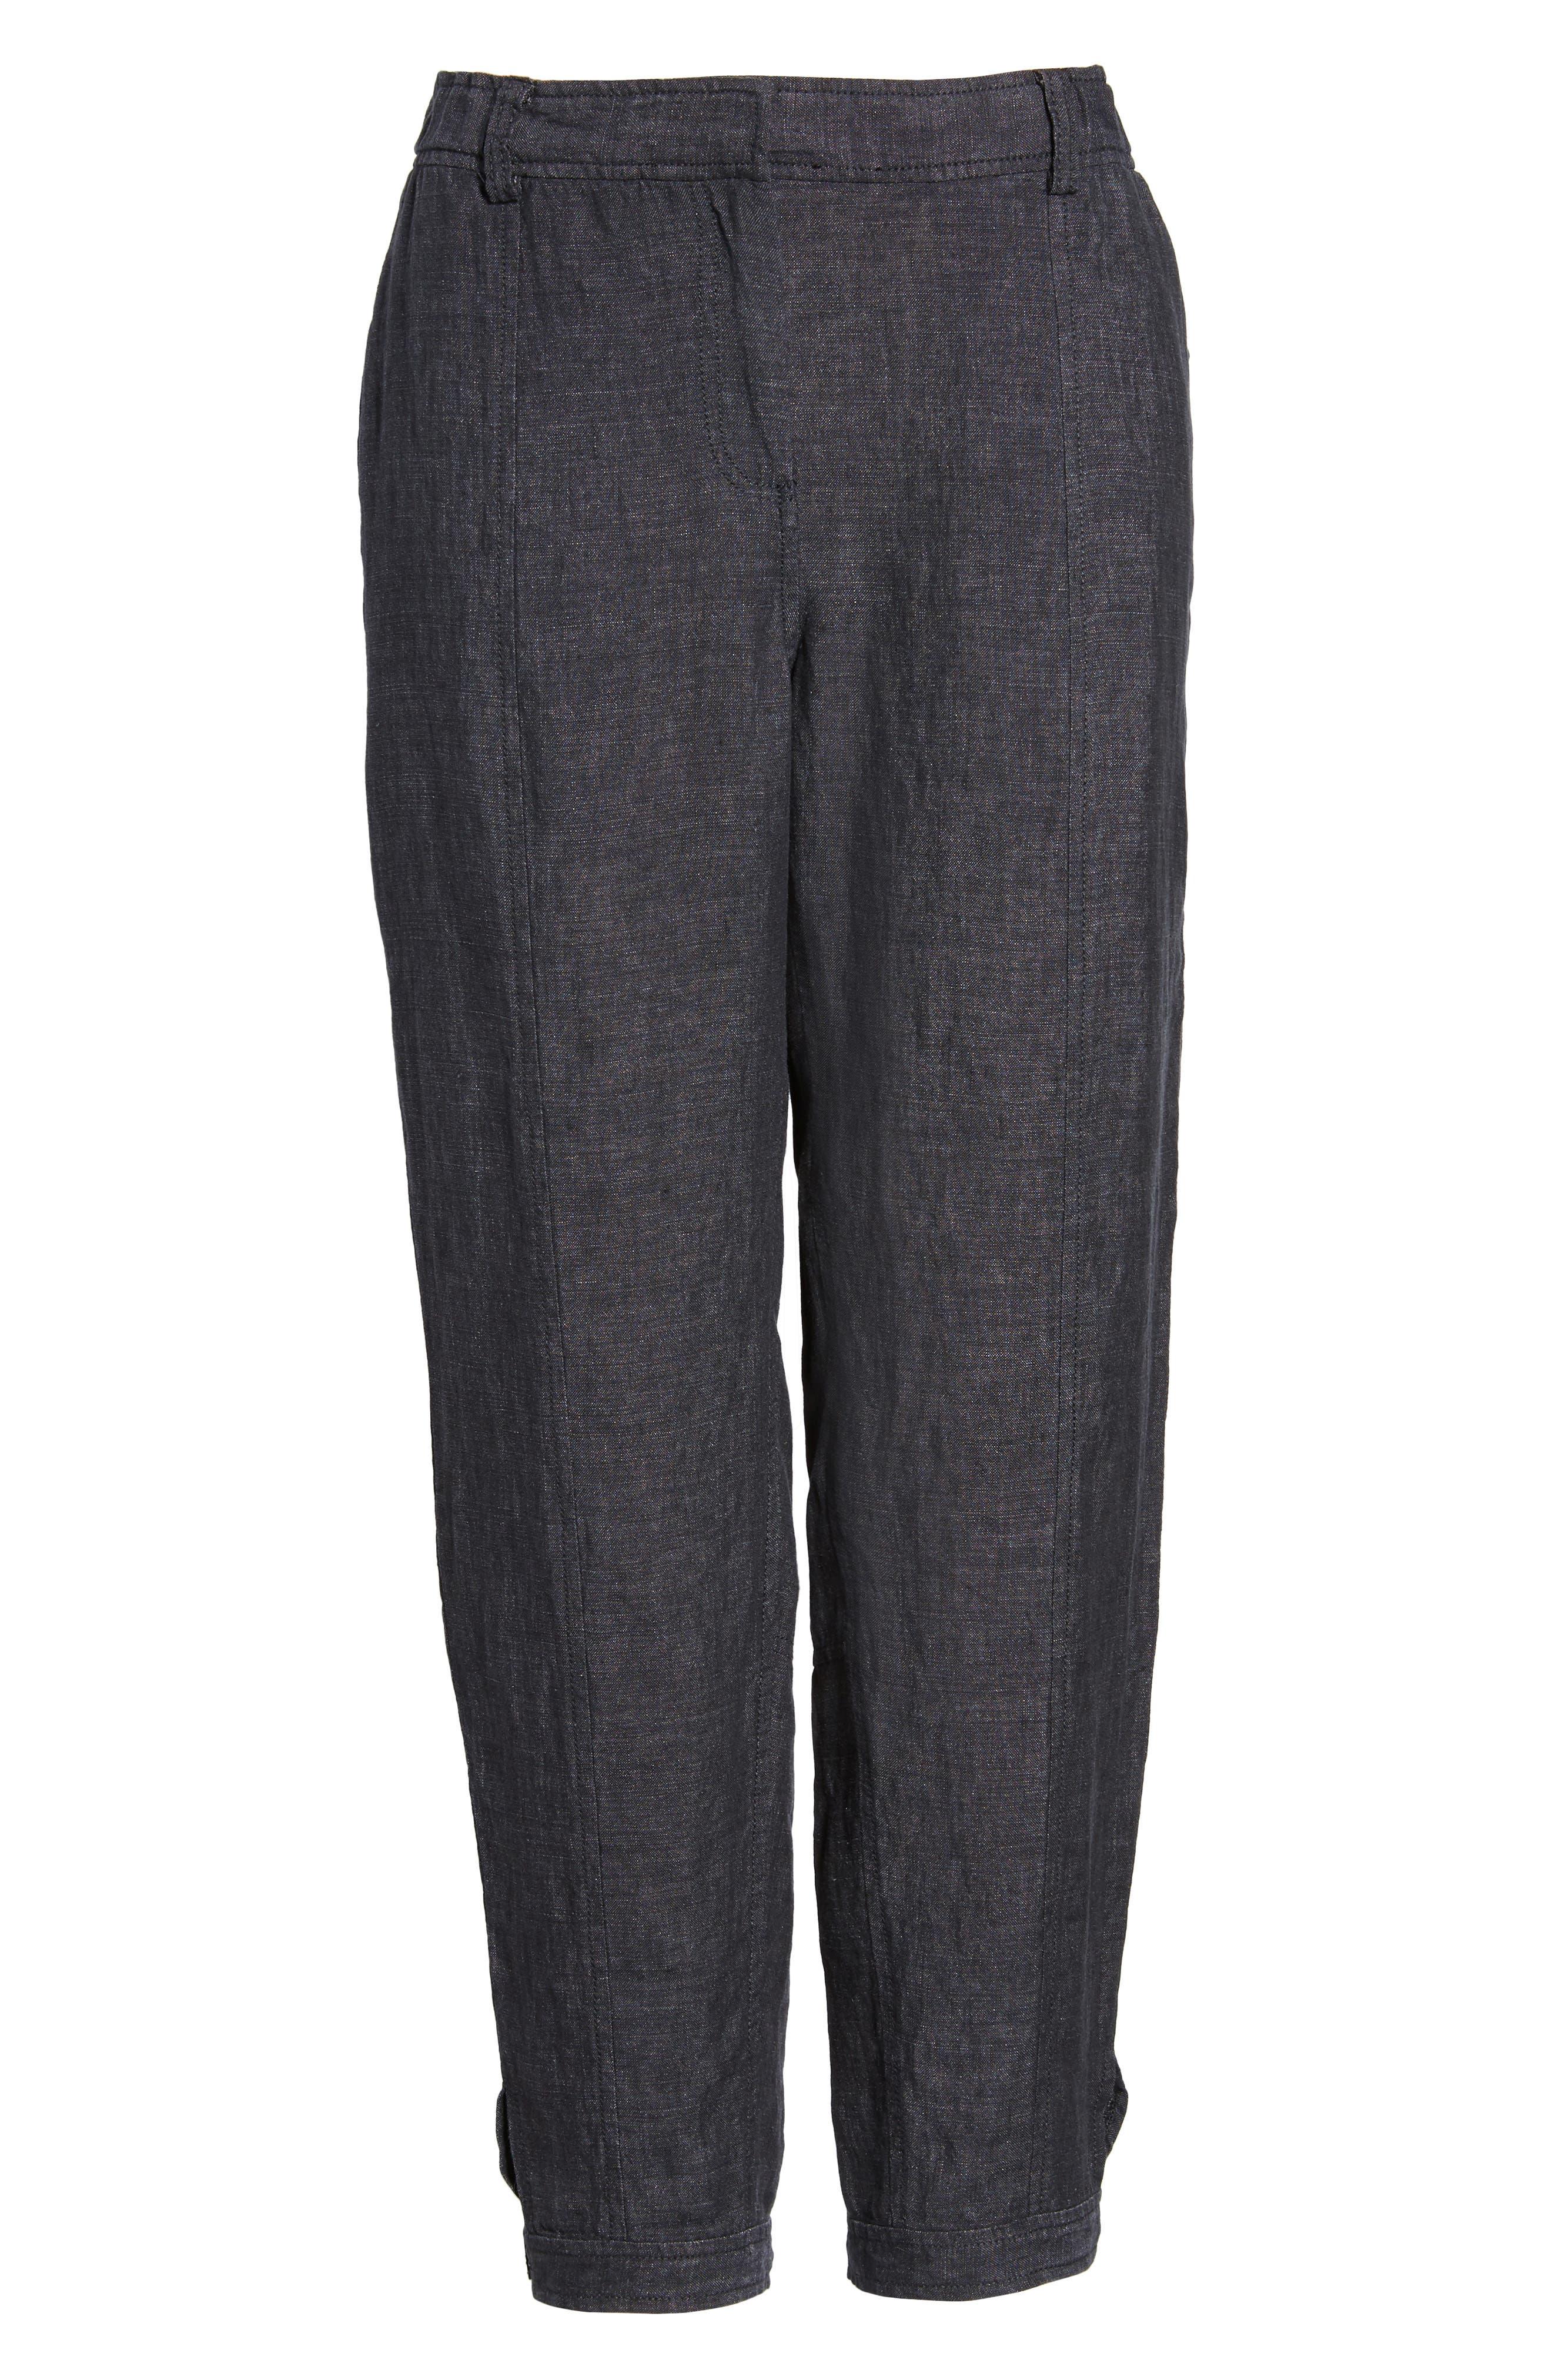 Easy Ankle Organic Linen Pants,                             Alternate thumbnail 12, color,